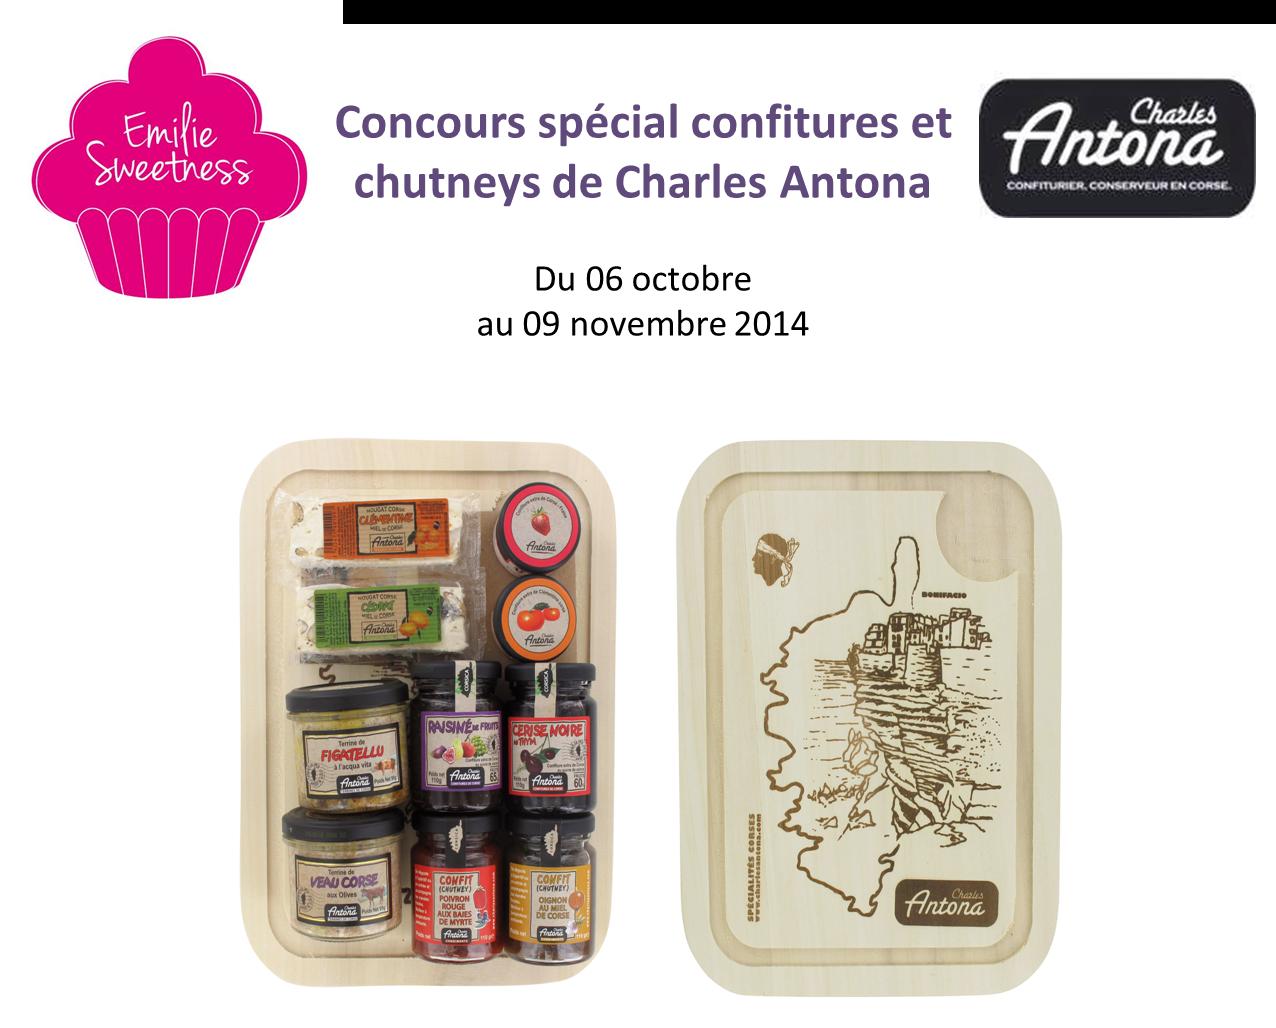 http://emiliesweetness.blogspot.co.uk/2014/10/concours-5-mois-du-blog-avec-charles.html